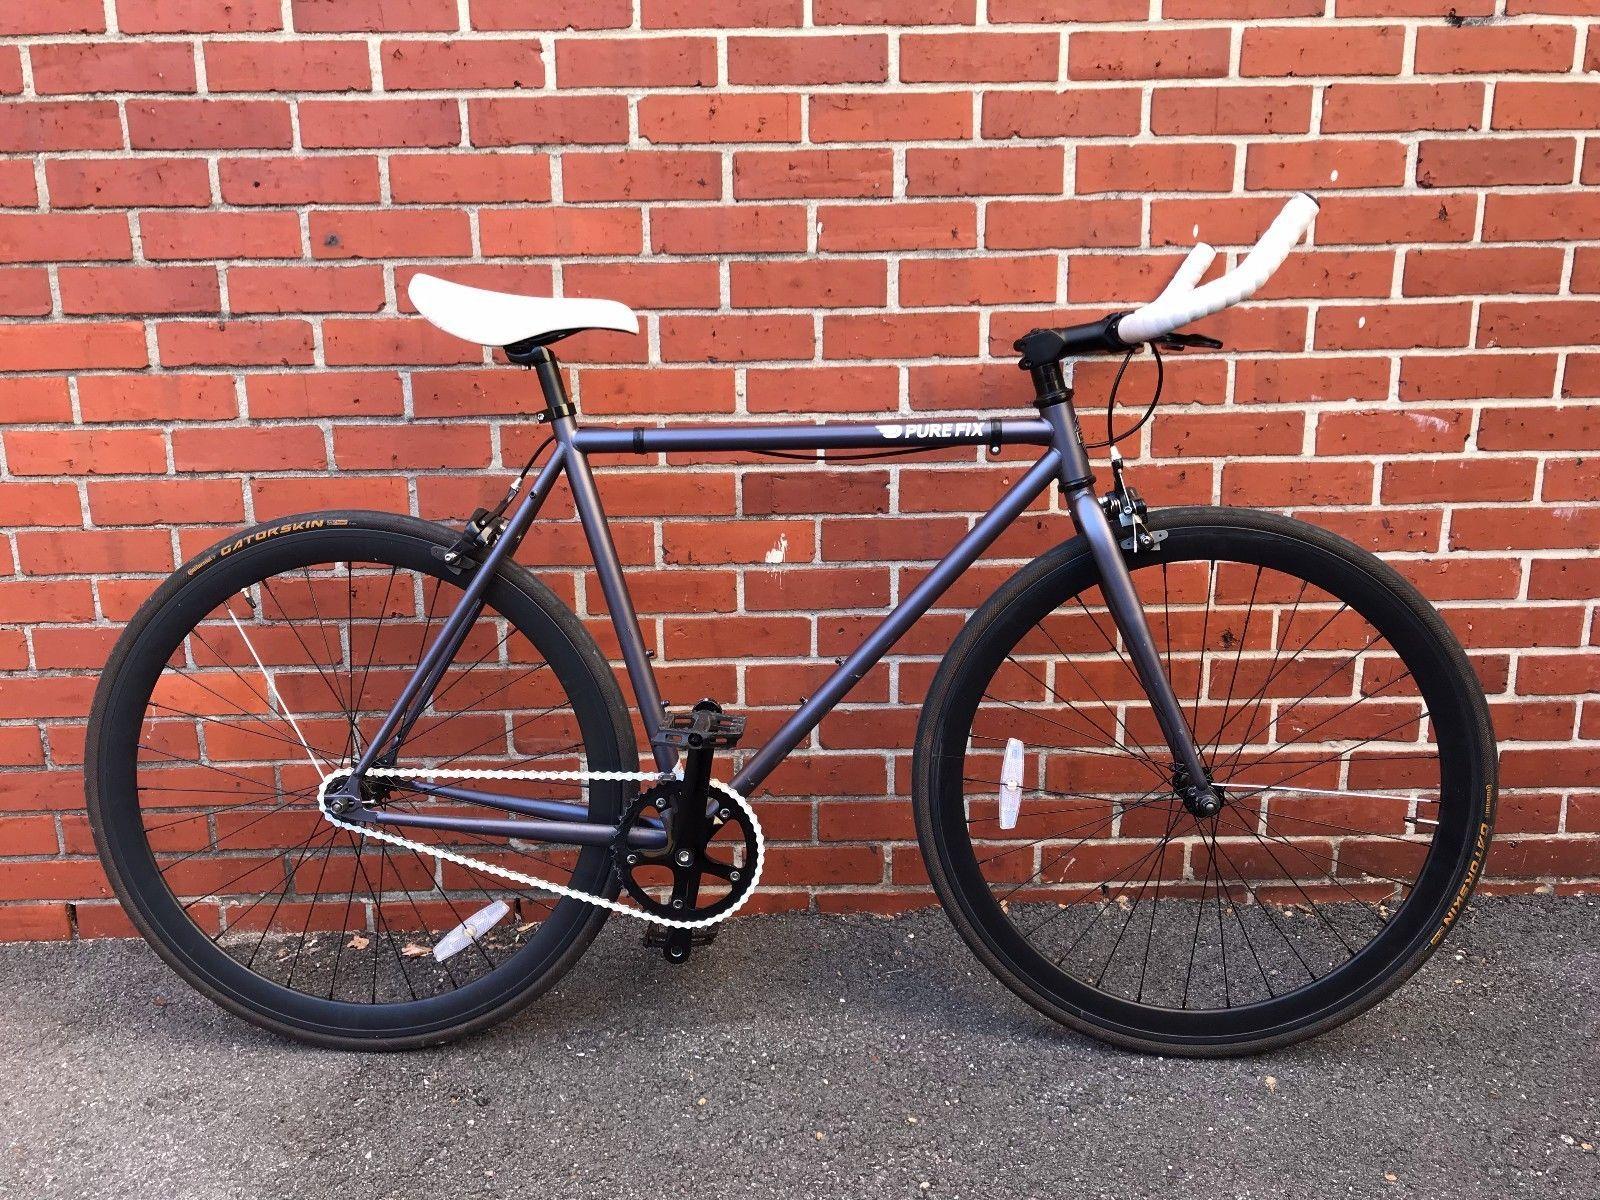 b500cc0221f ON SALE: Pure Fix Original Fixed Gear Single Speed Fixie Bike Free Wheel 54  cm